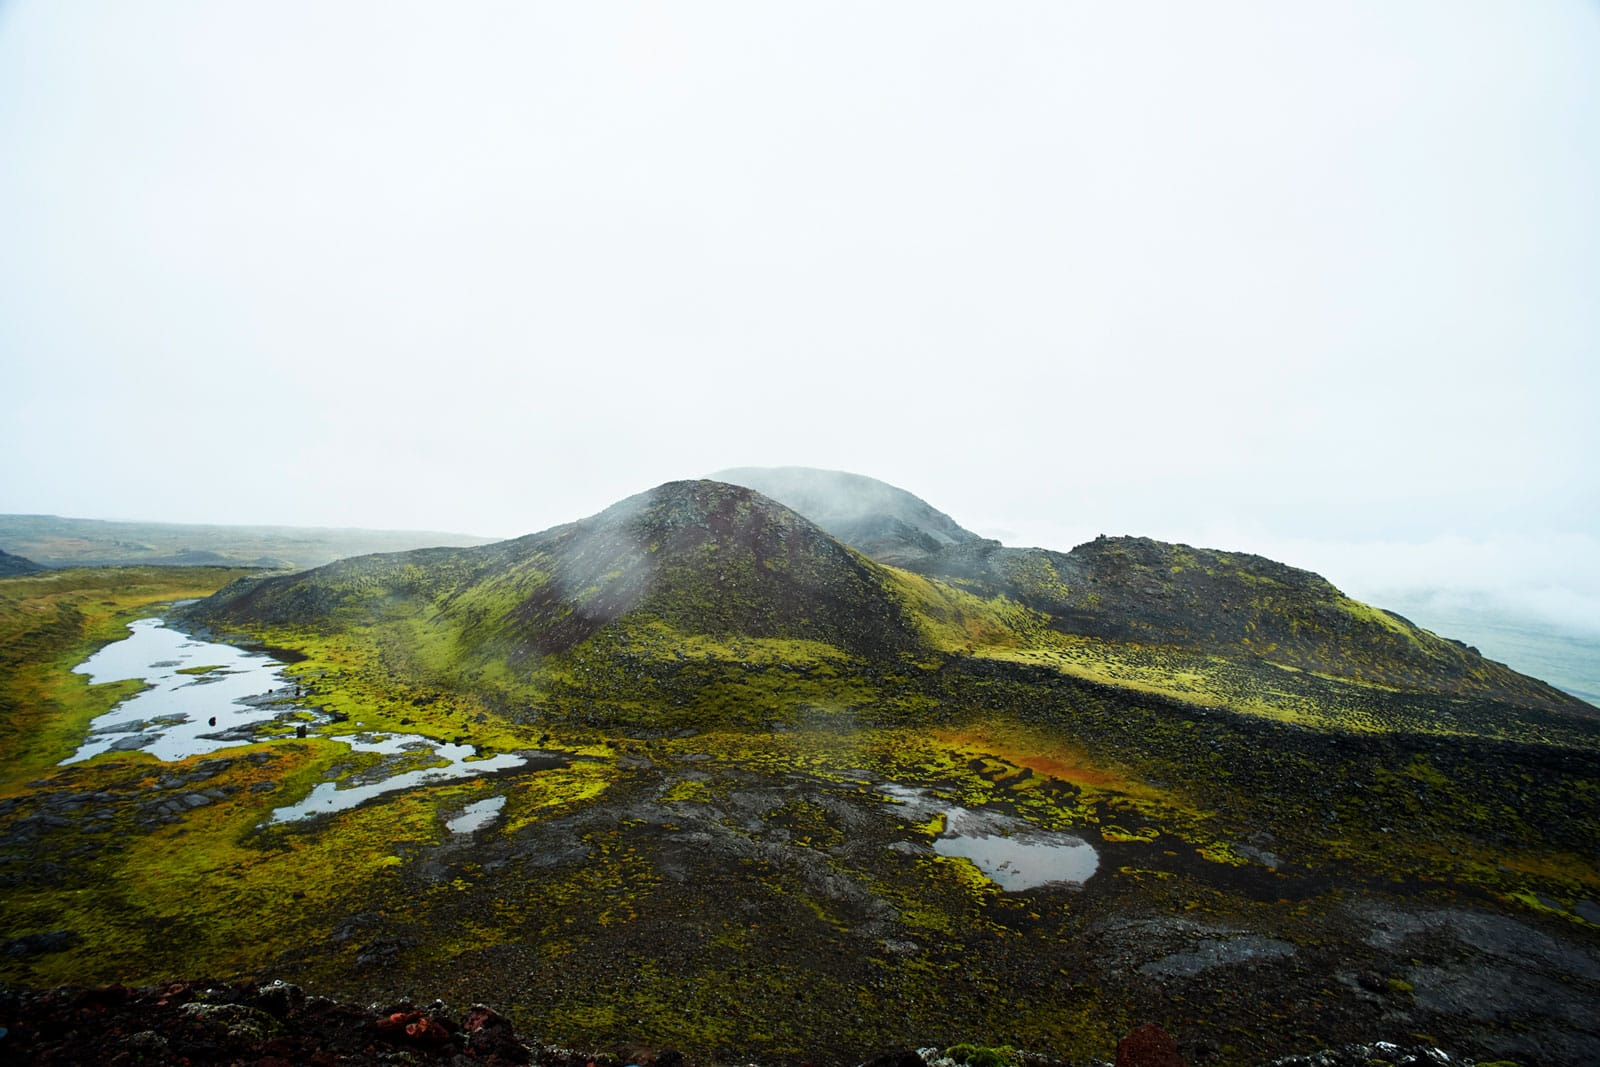 grüne Berglandschaft im schwarzen Vulkangebiet